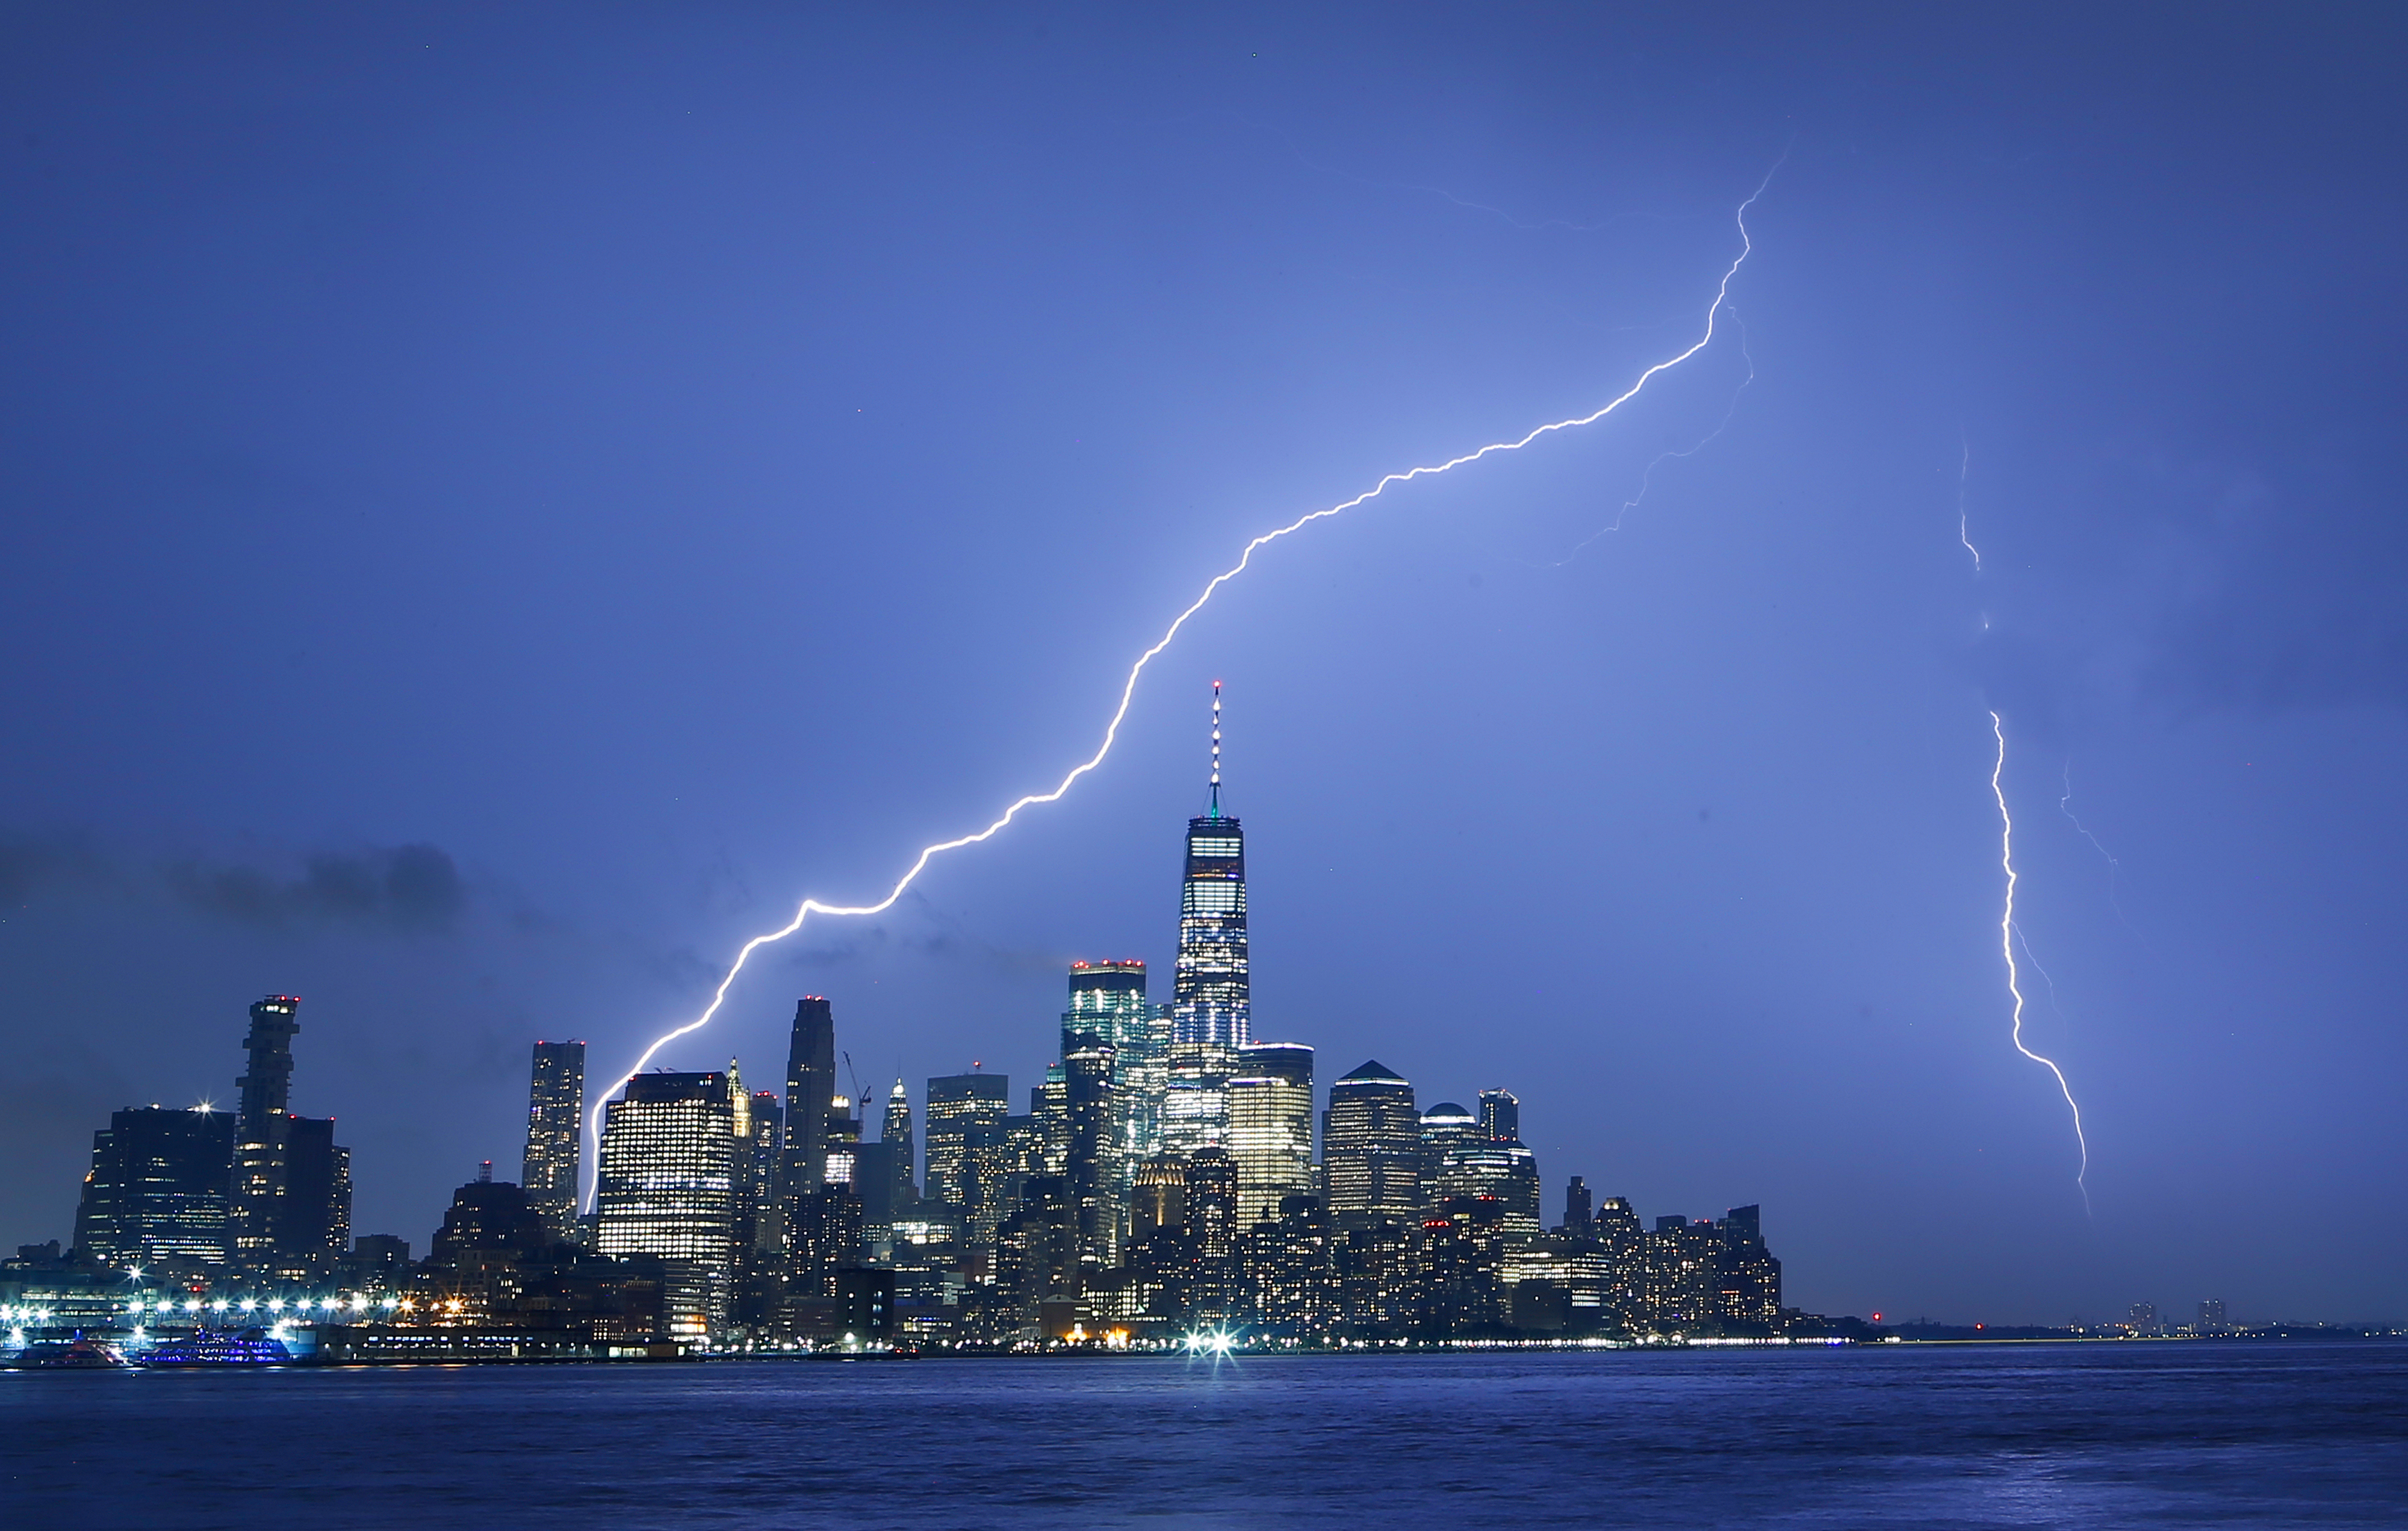 Lightning Strikes in New York City